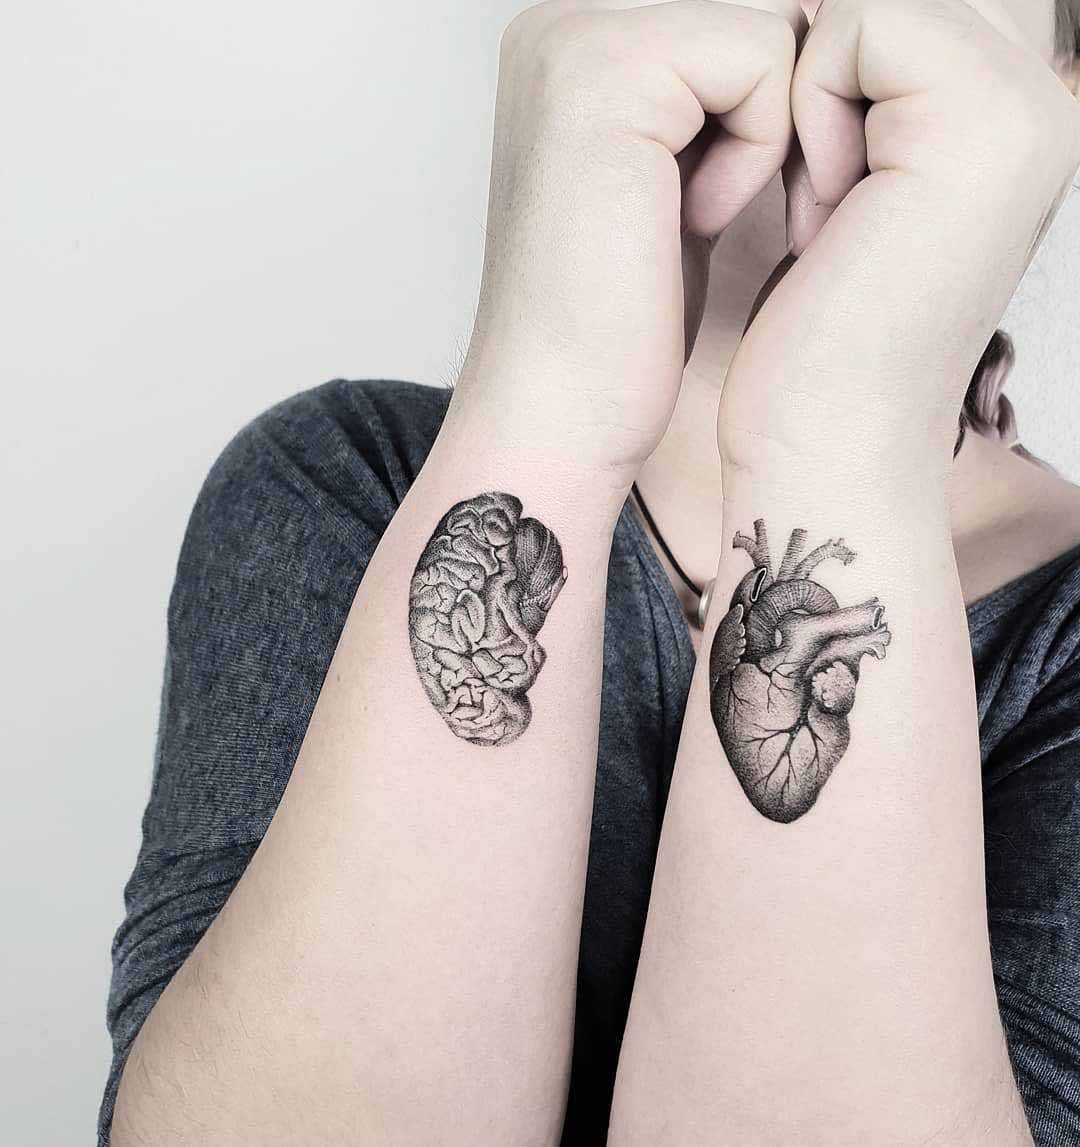 wrist tattoos brain and heart